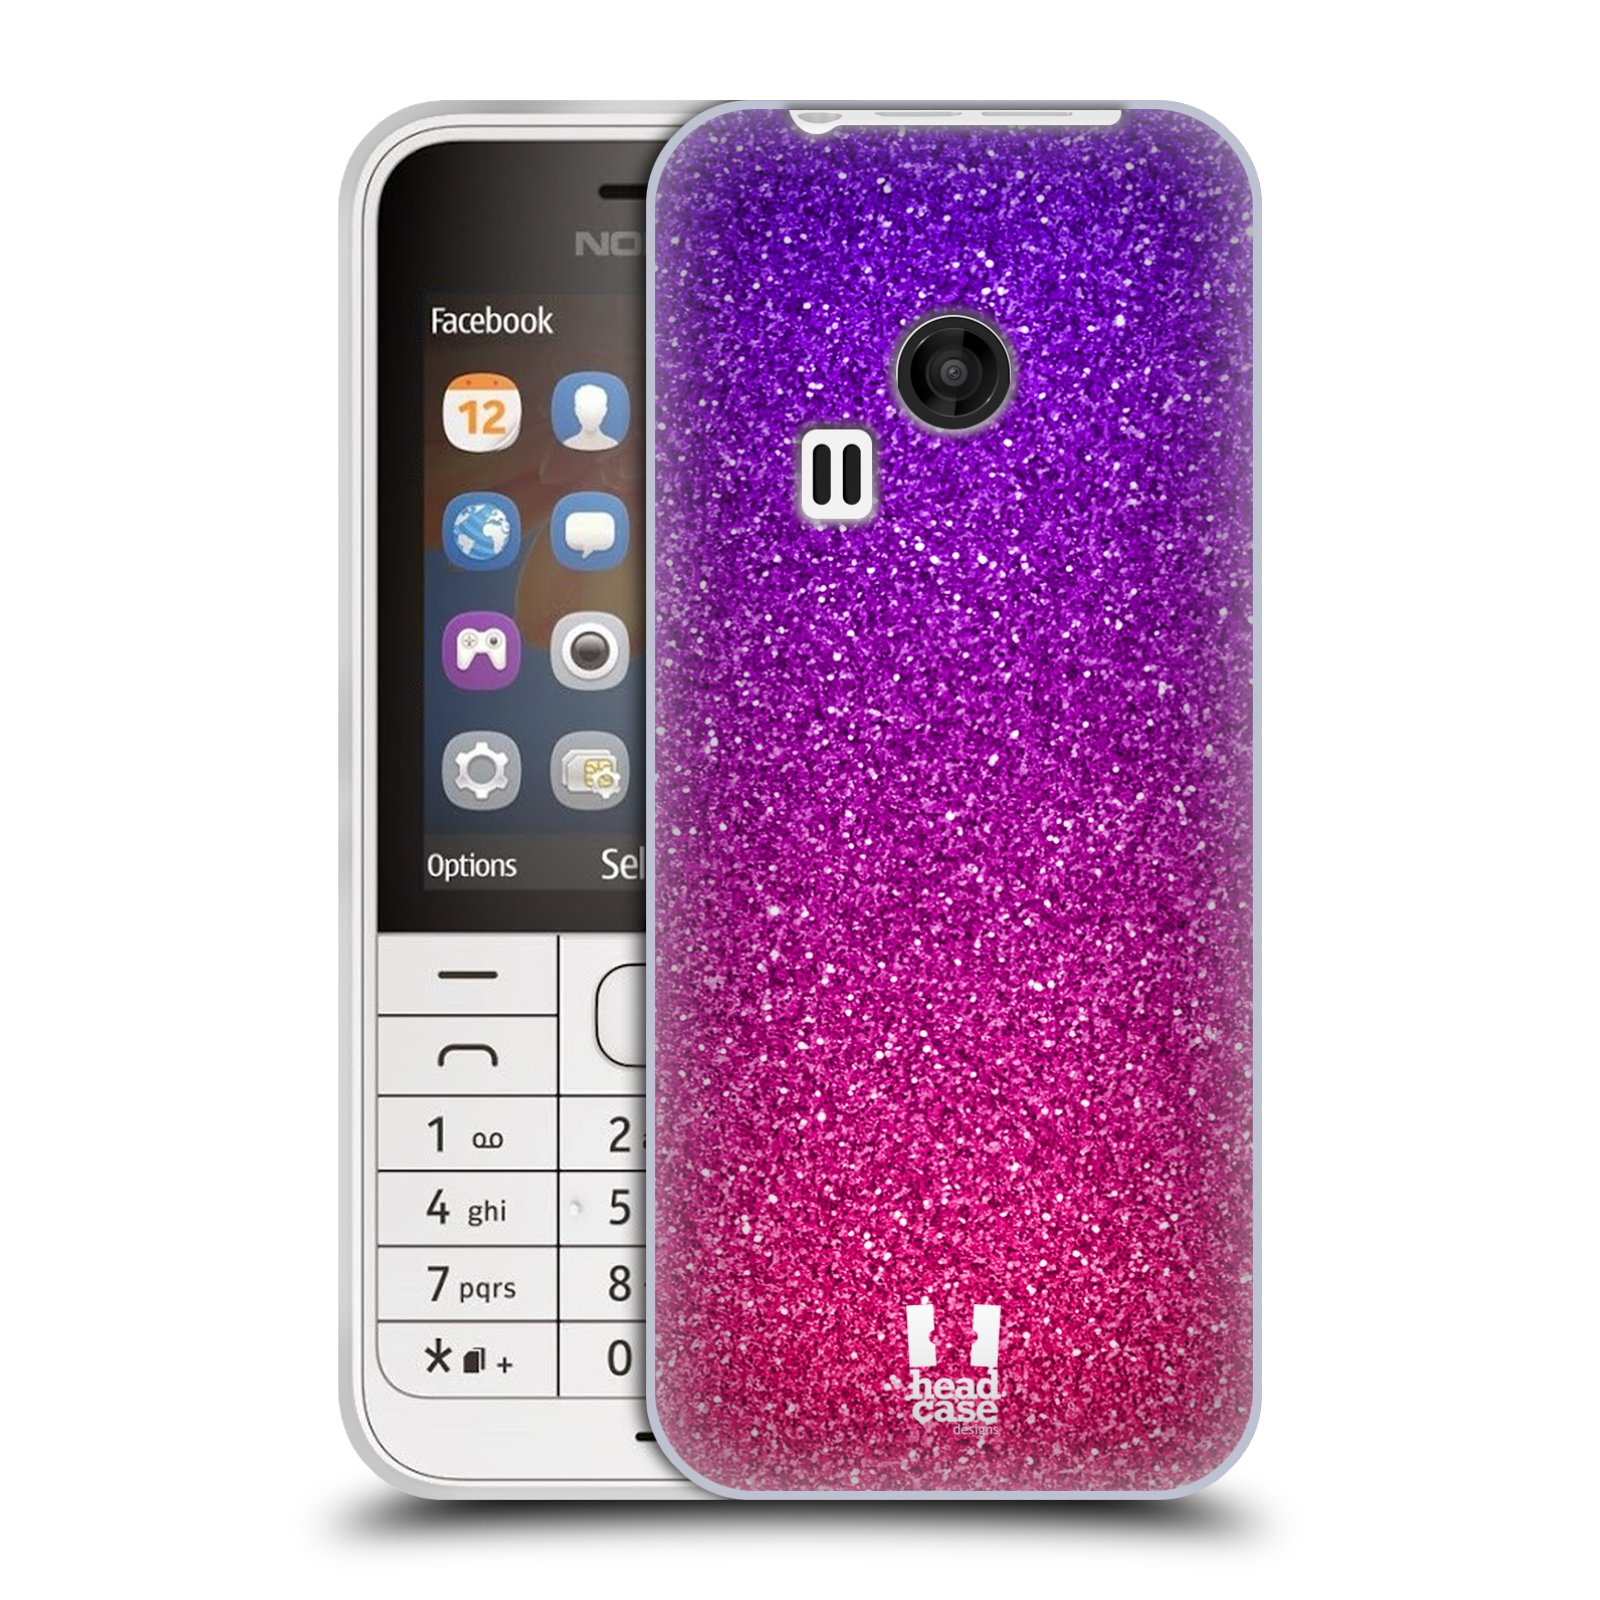 Silikonové pouzdro na mobil Nokia 220 HEAD CASE MIX PINK (Silikonový kryt či obal na mobilní telefon Nokia 220 a 220 Dual SIM)